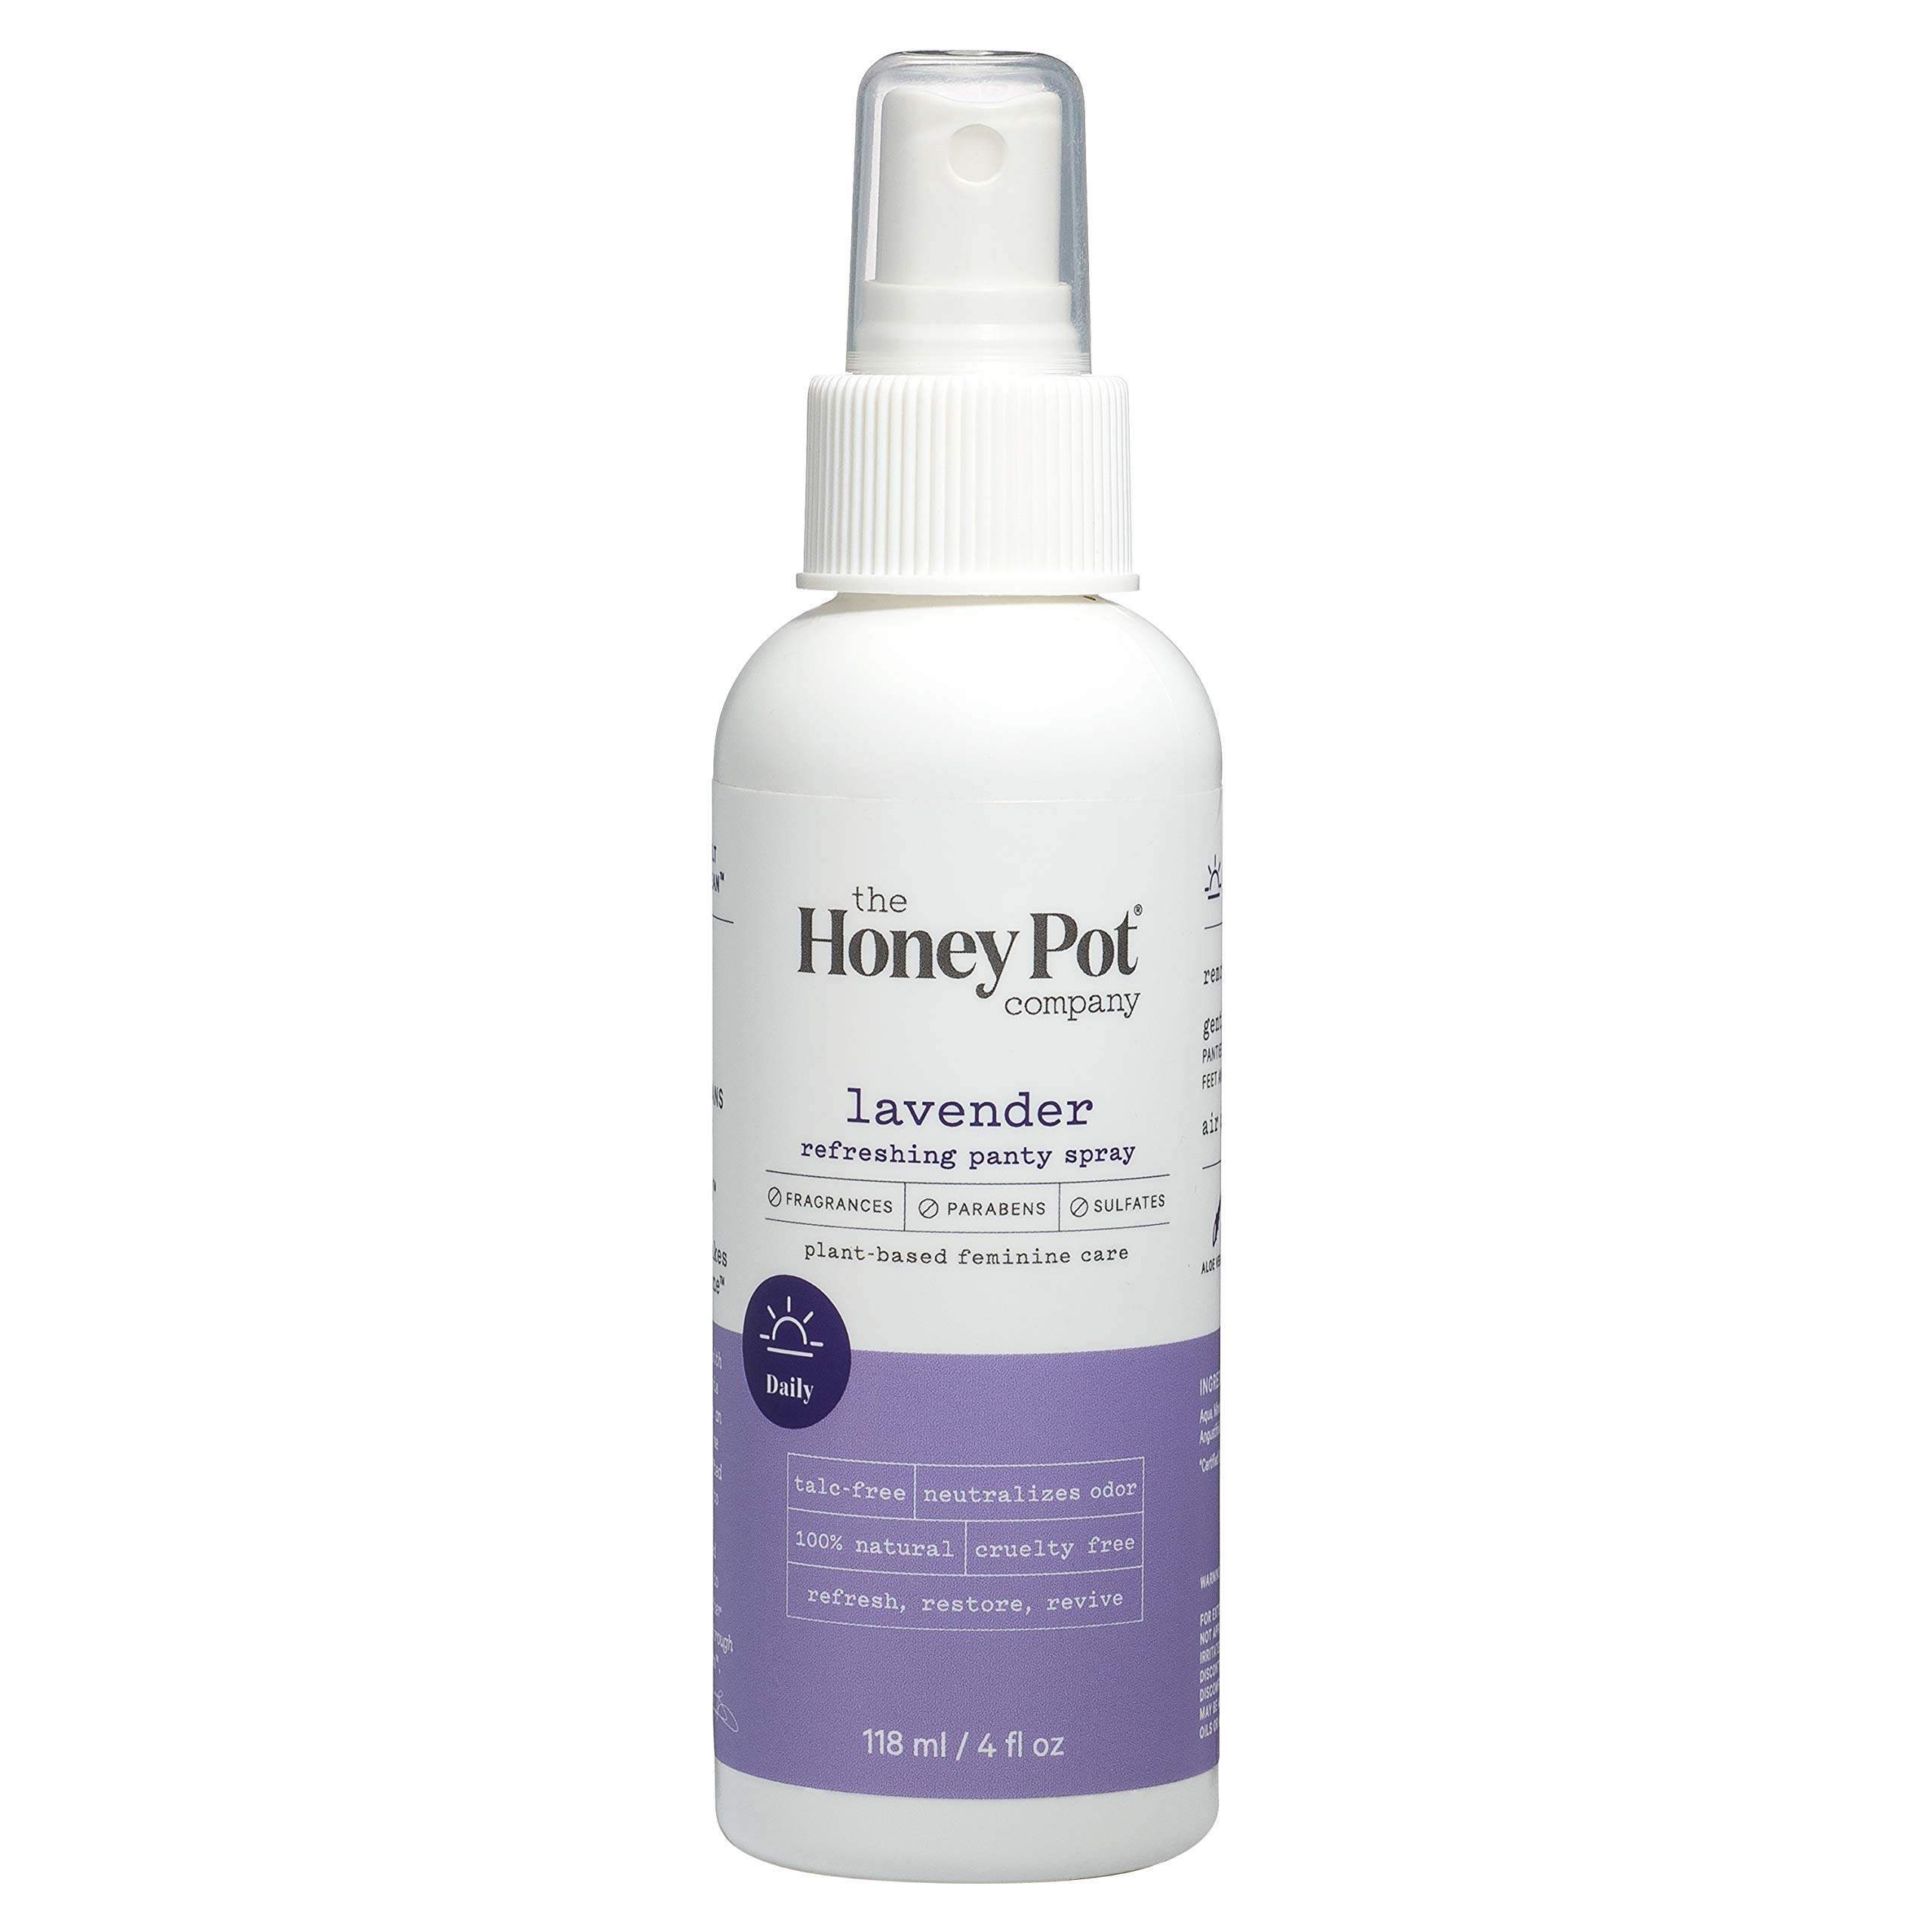 Honey Pot Refreshing Panty Lavender